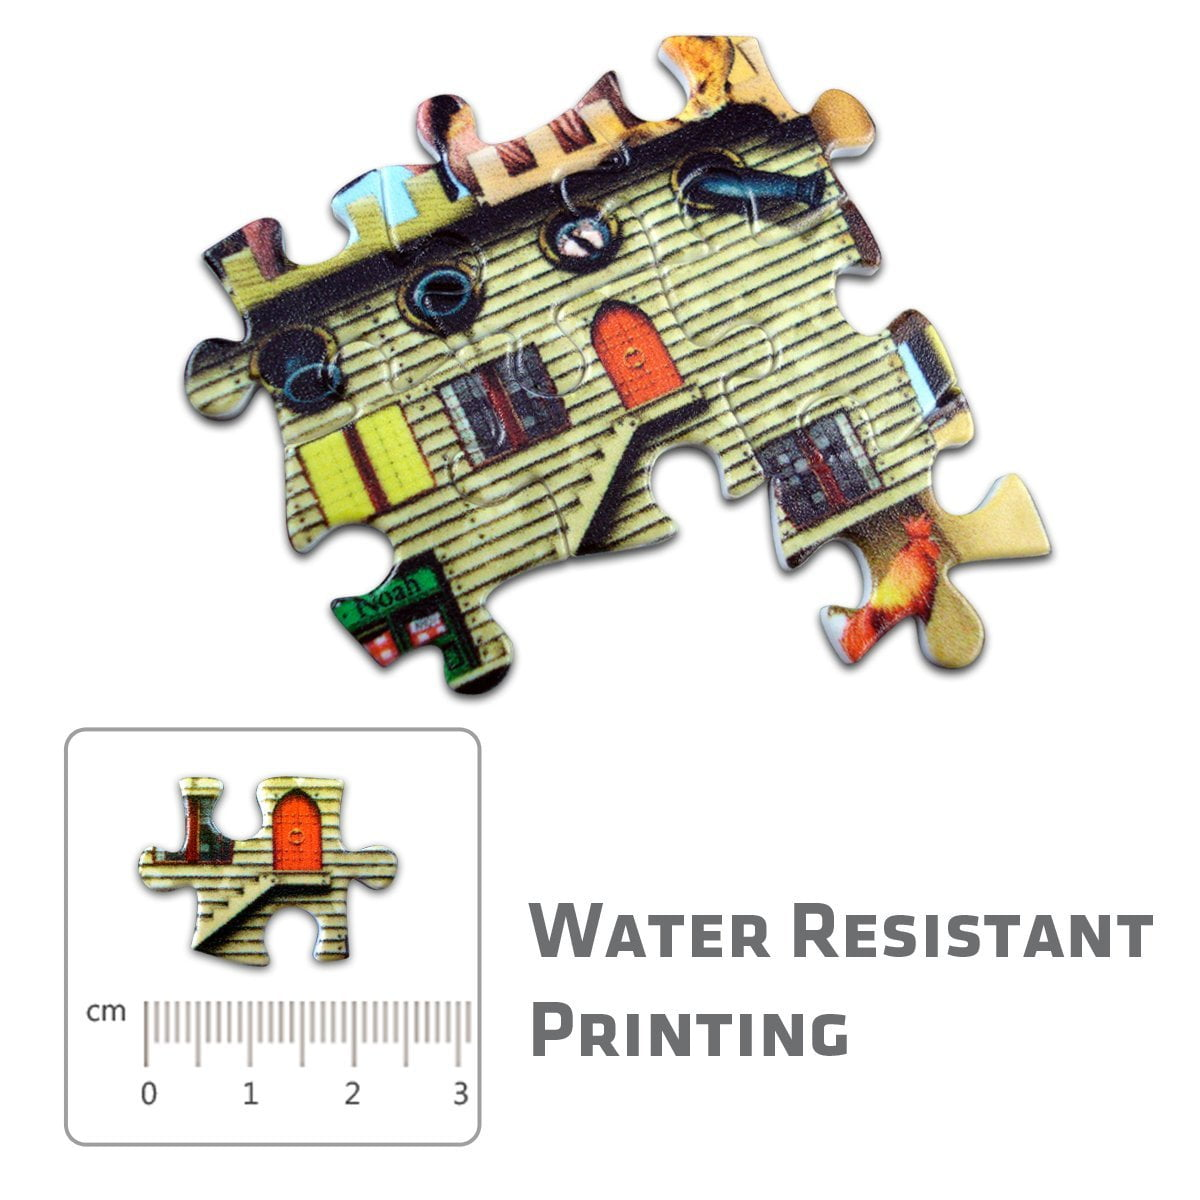 Water Resistand Printing